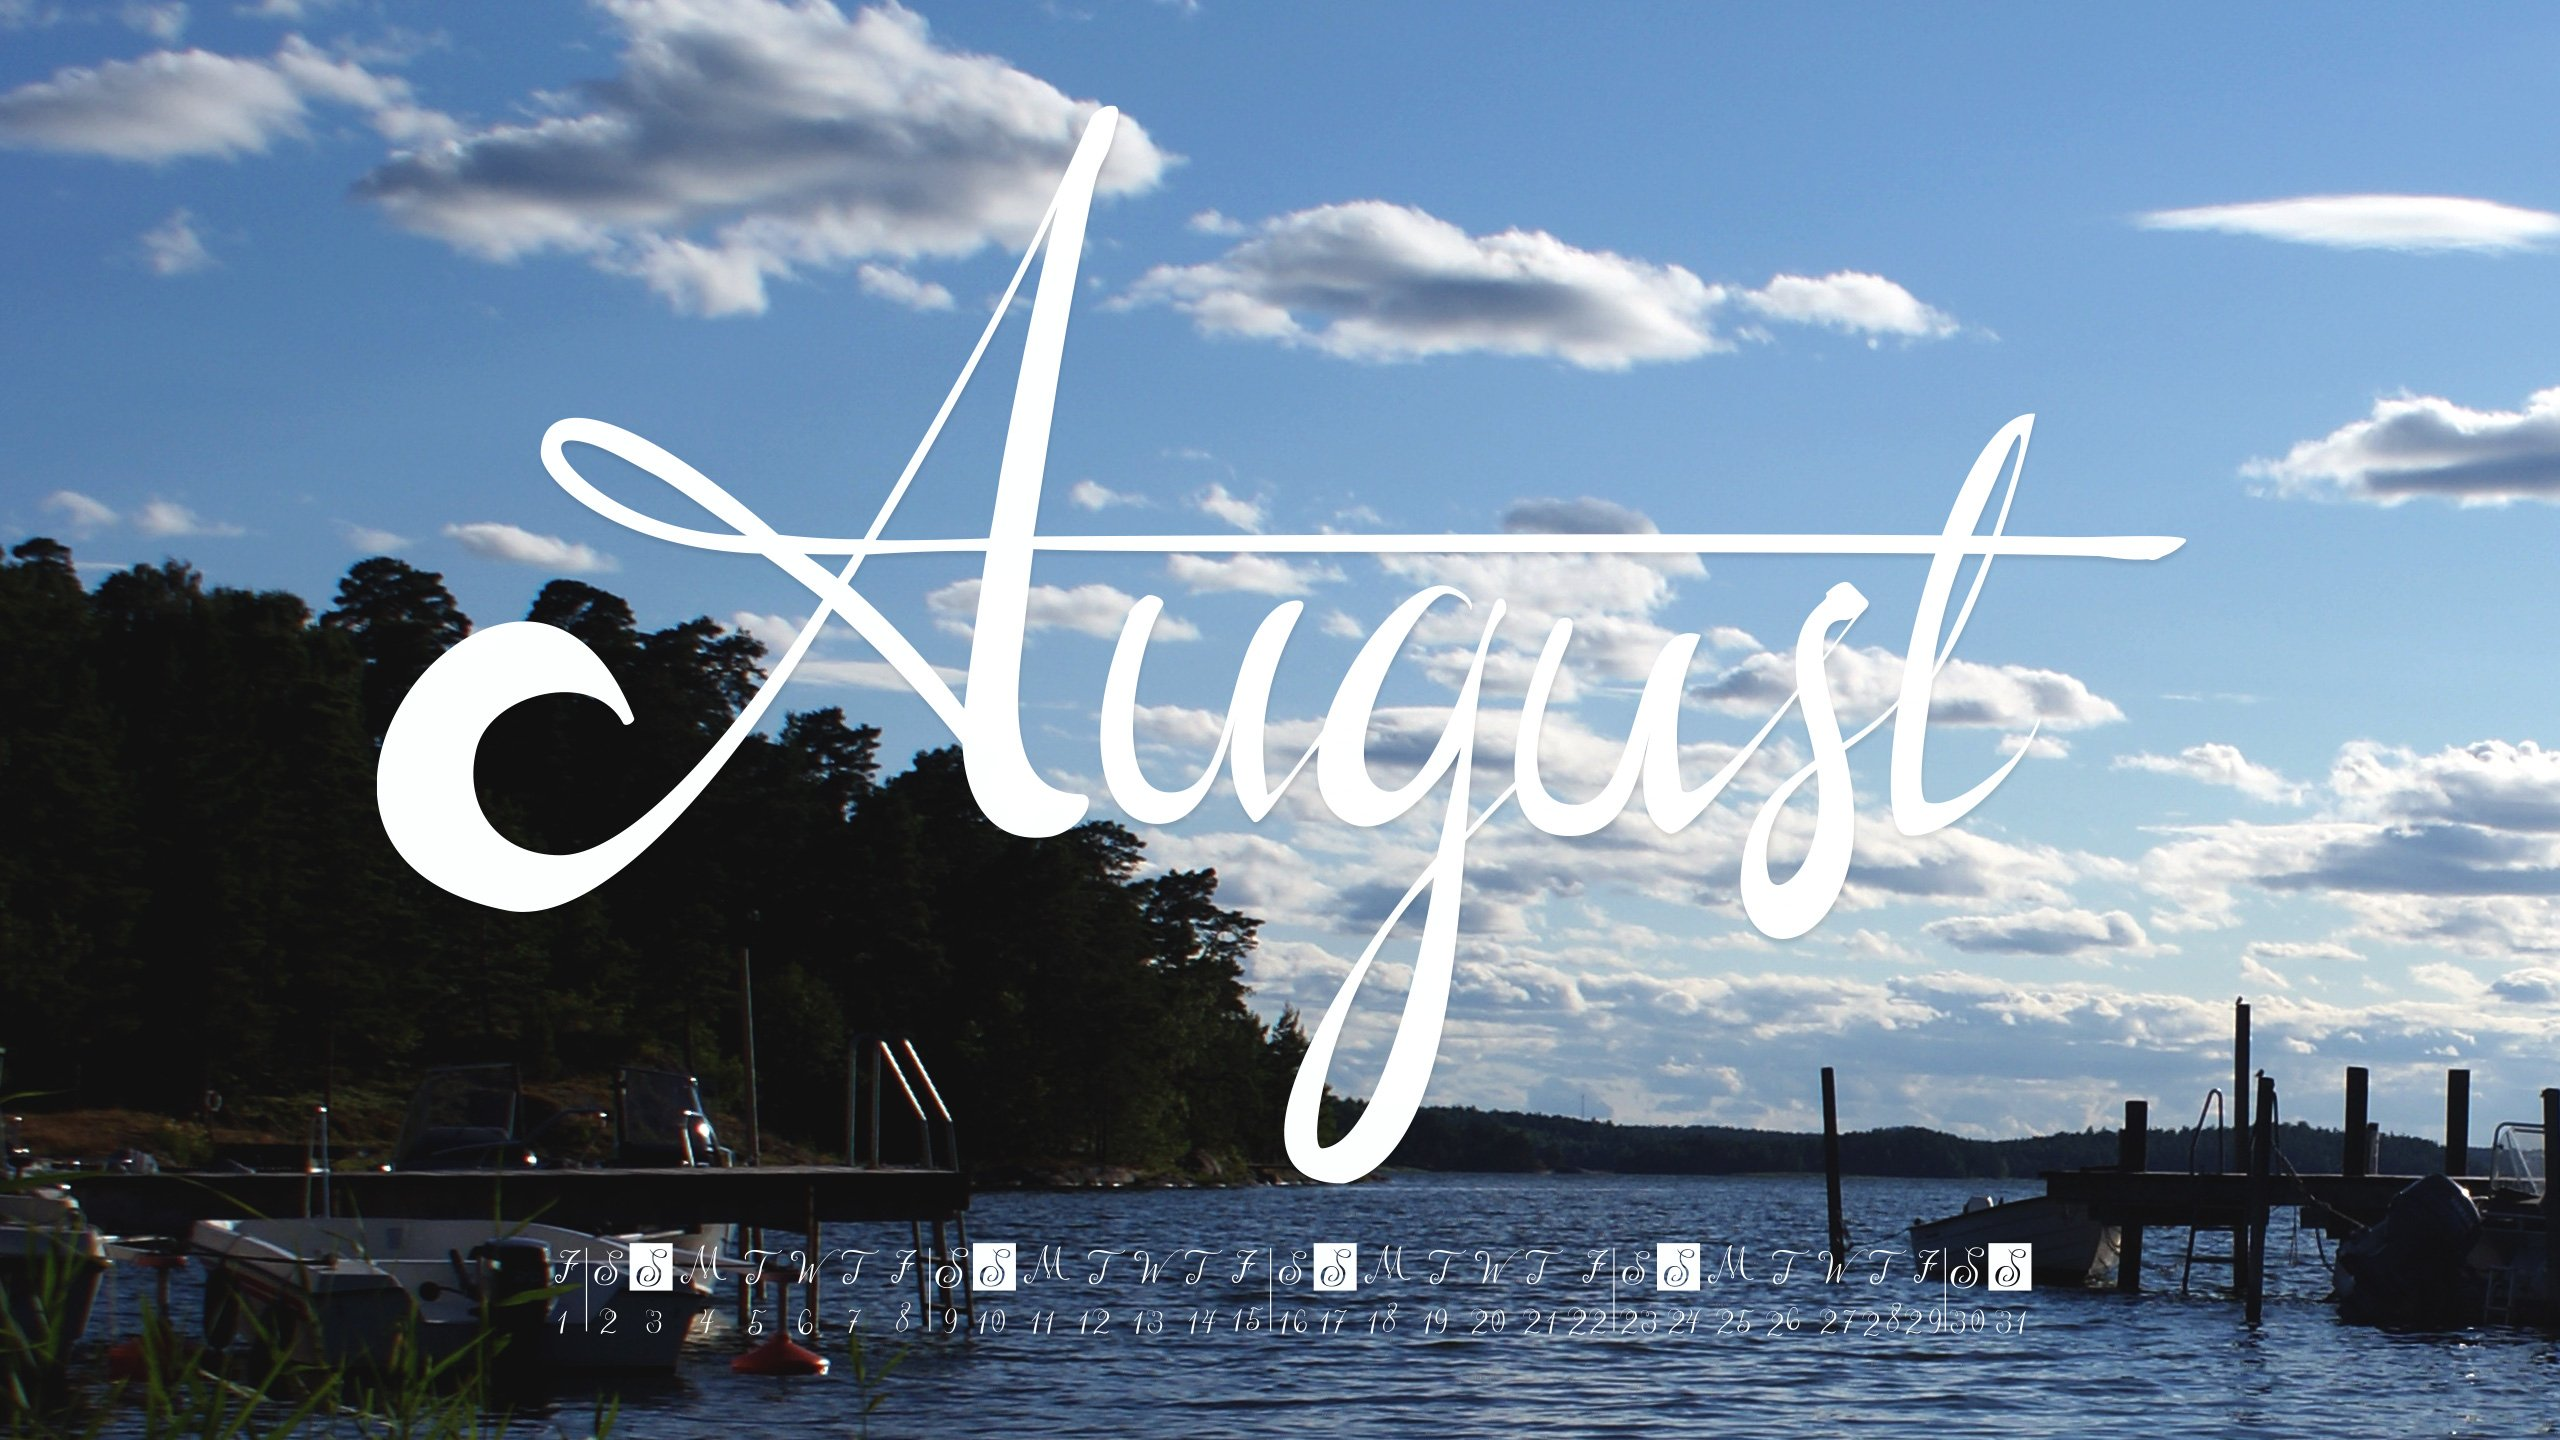 Best 47 August Desktop Backgrounds on HipWallpaper Beautiful 2560x1440